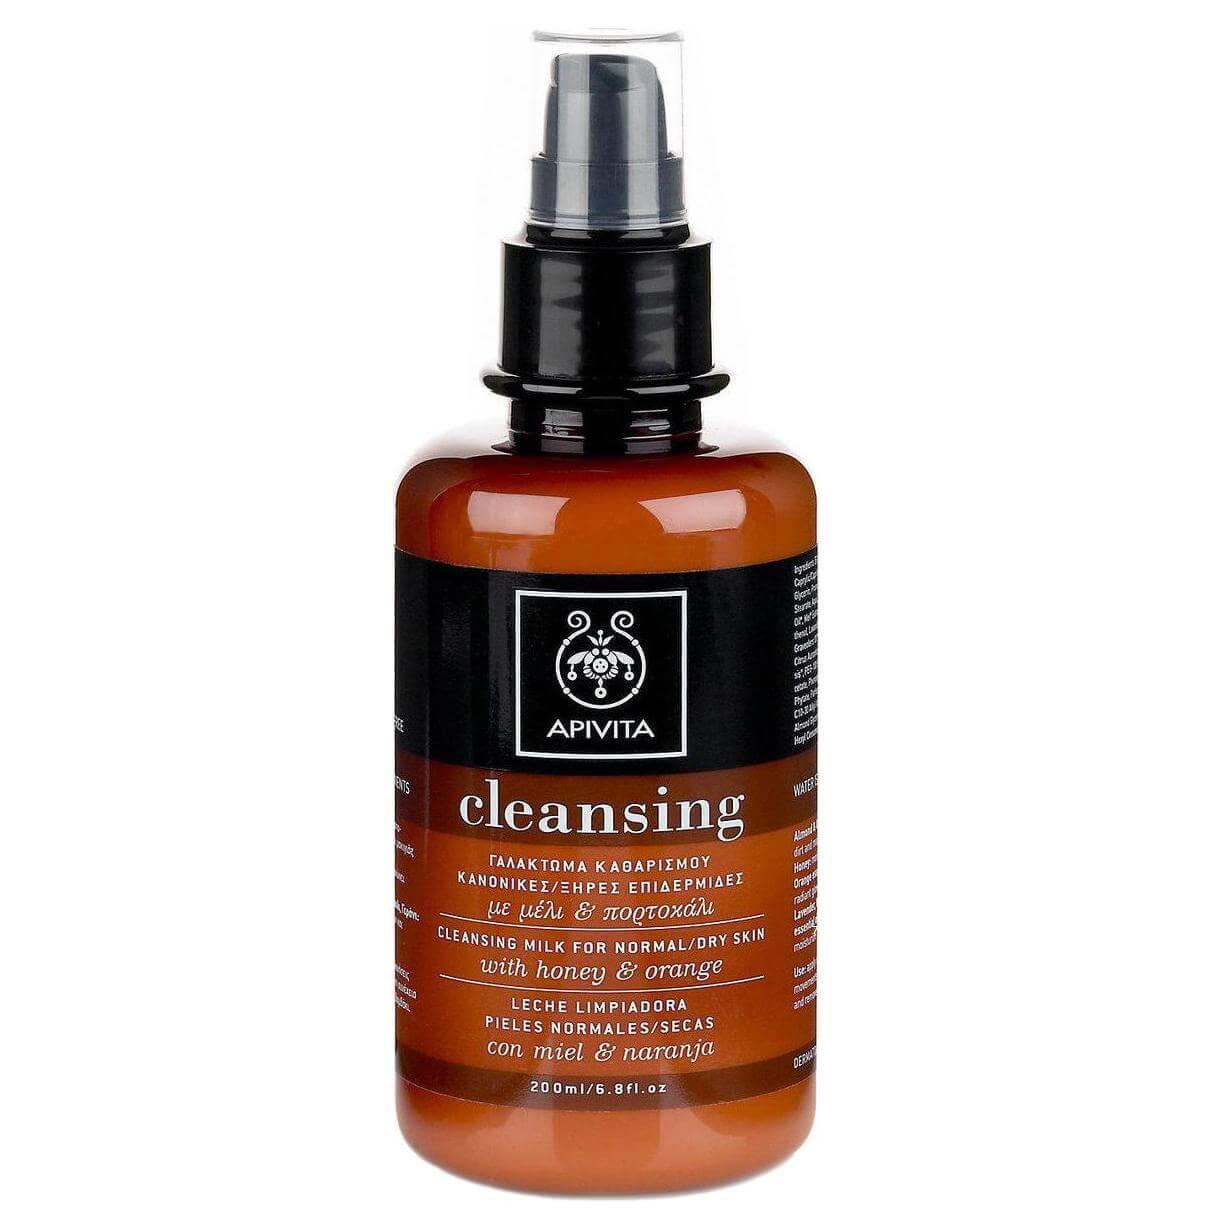 Apivita Γαλάκτωμα Καθαρισμού Για Κανονικές/Ξηρές Επιδερμίδες Με Μέλι & Πορτοκάλι 200ml